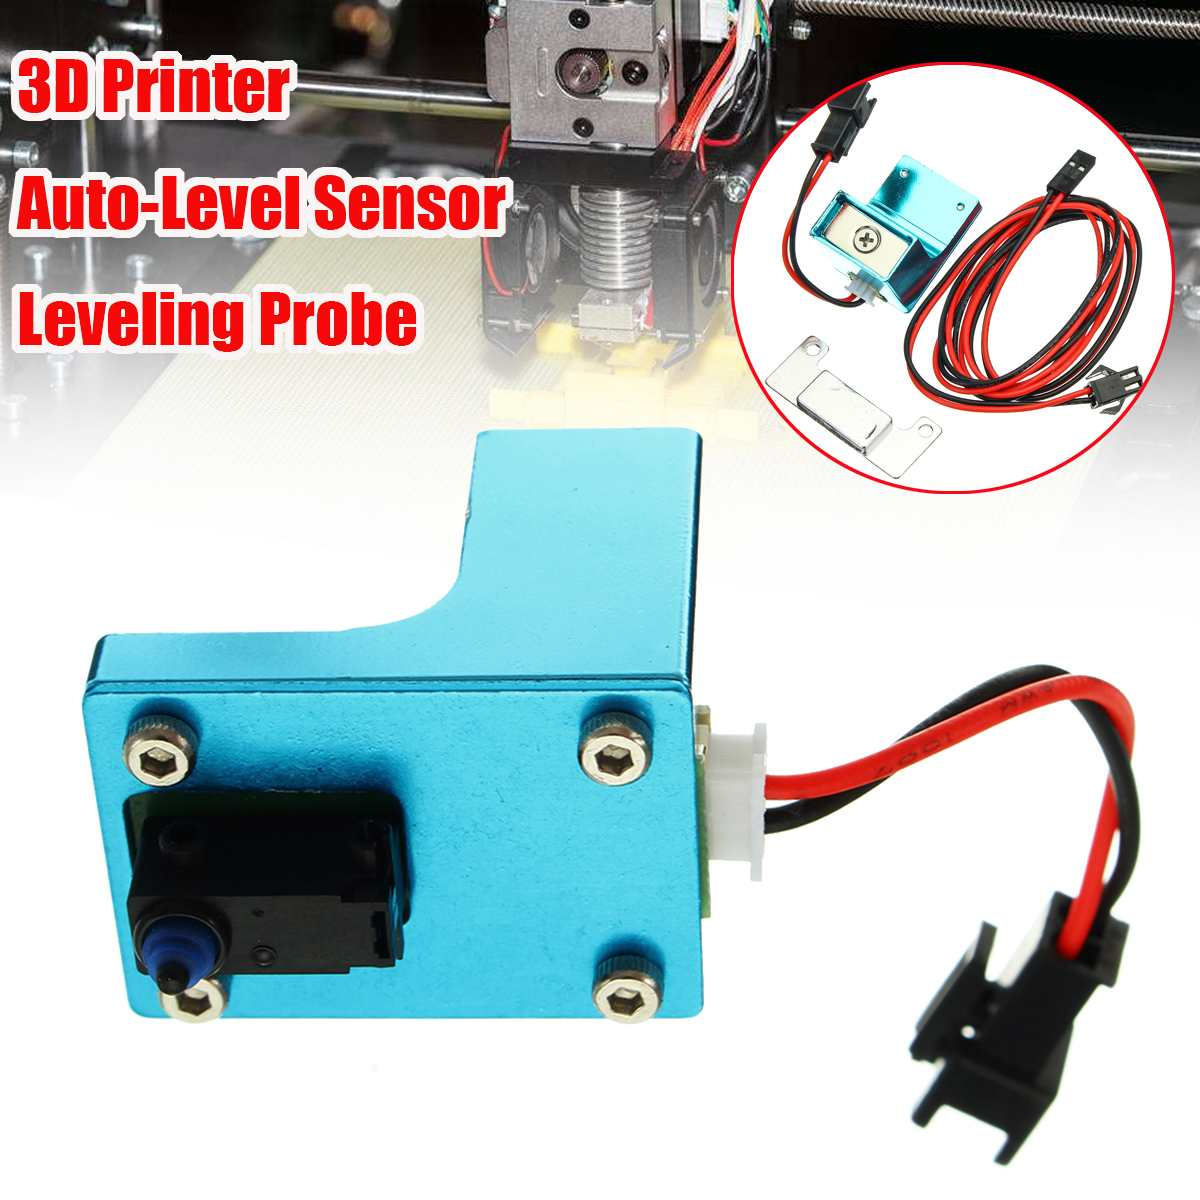 HICTOP 3D Printer Self Leveling Upgrade Auto Leveling Sensor Bed Self Adjustment Inductive Proximity Sensor